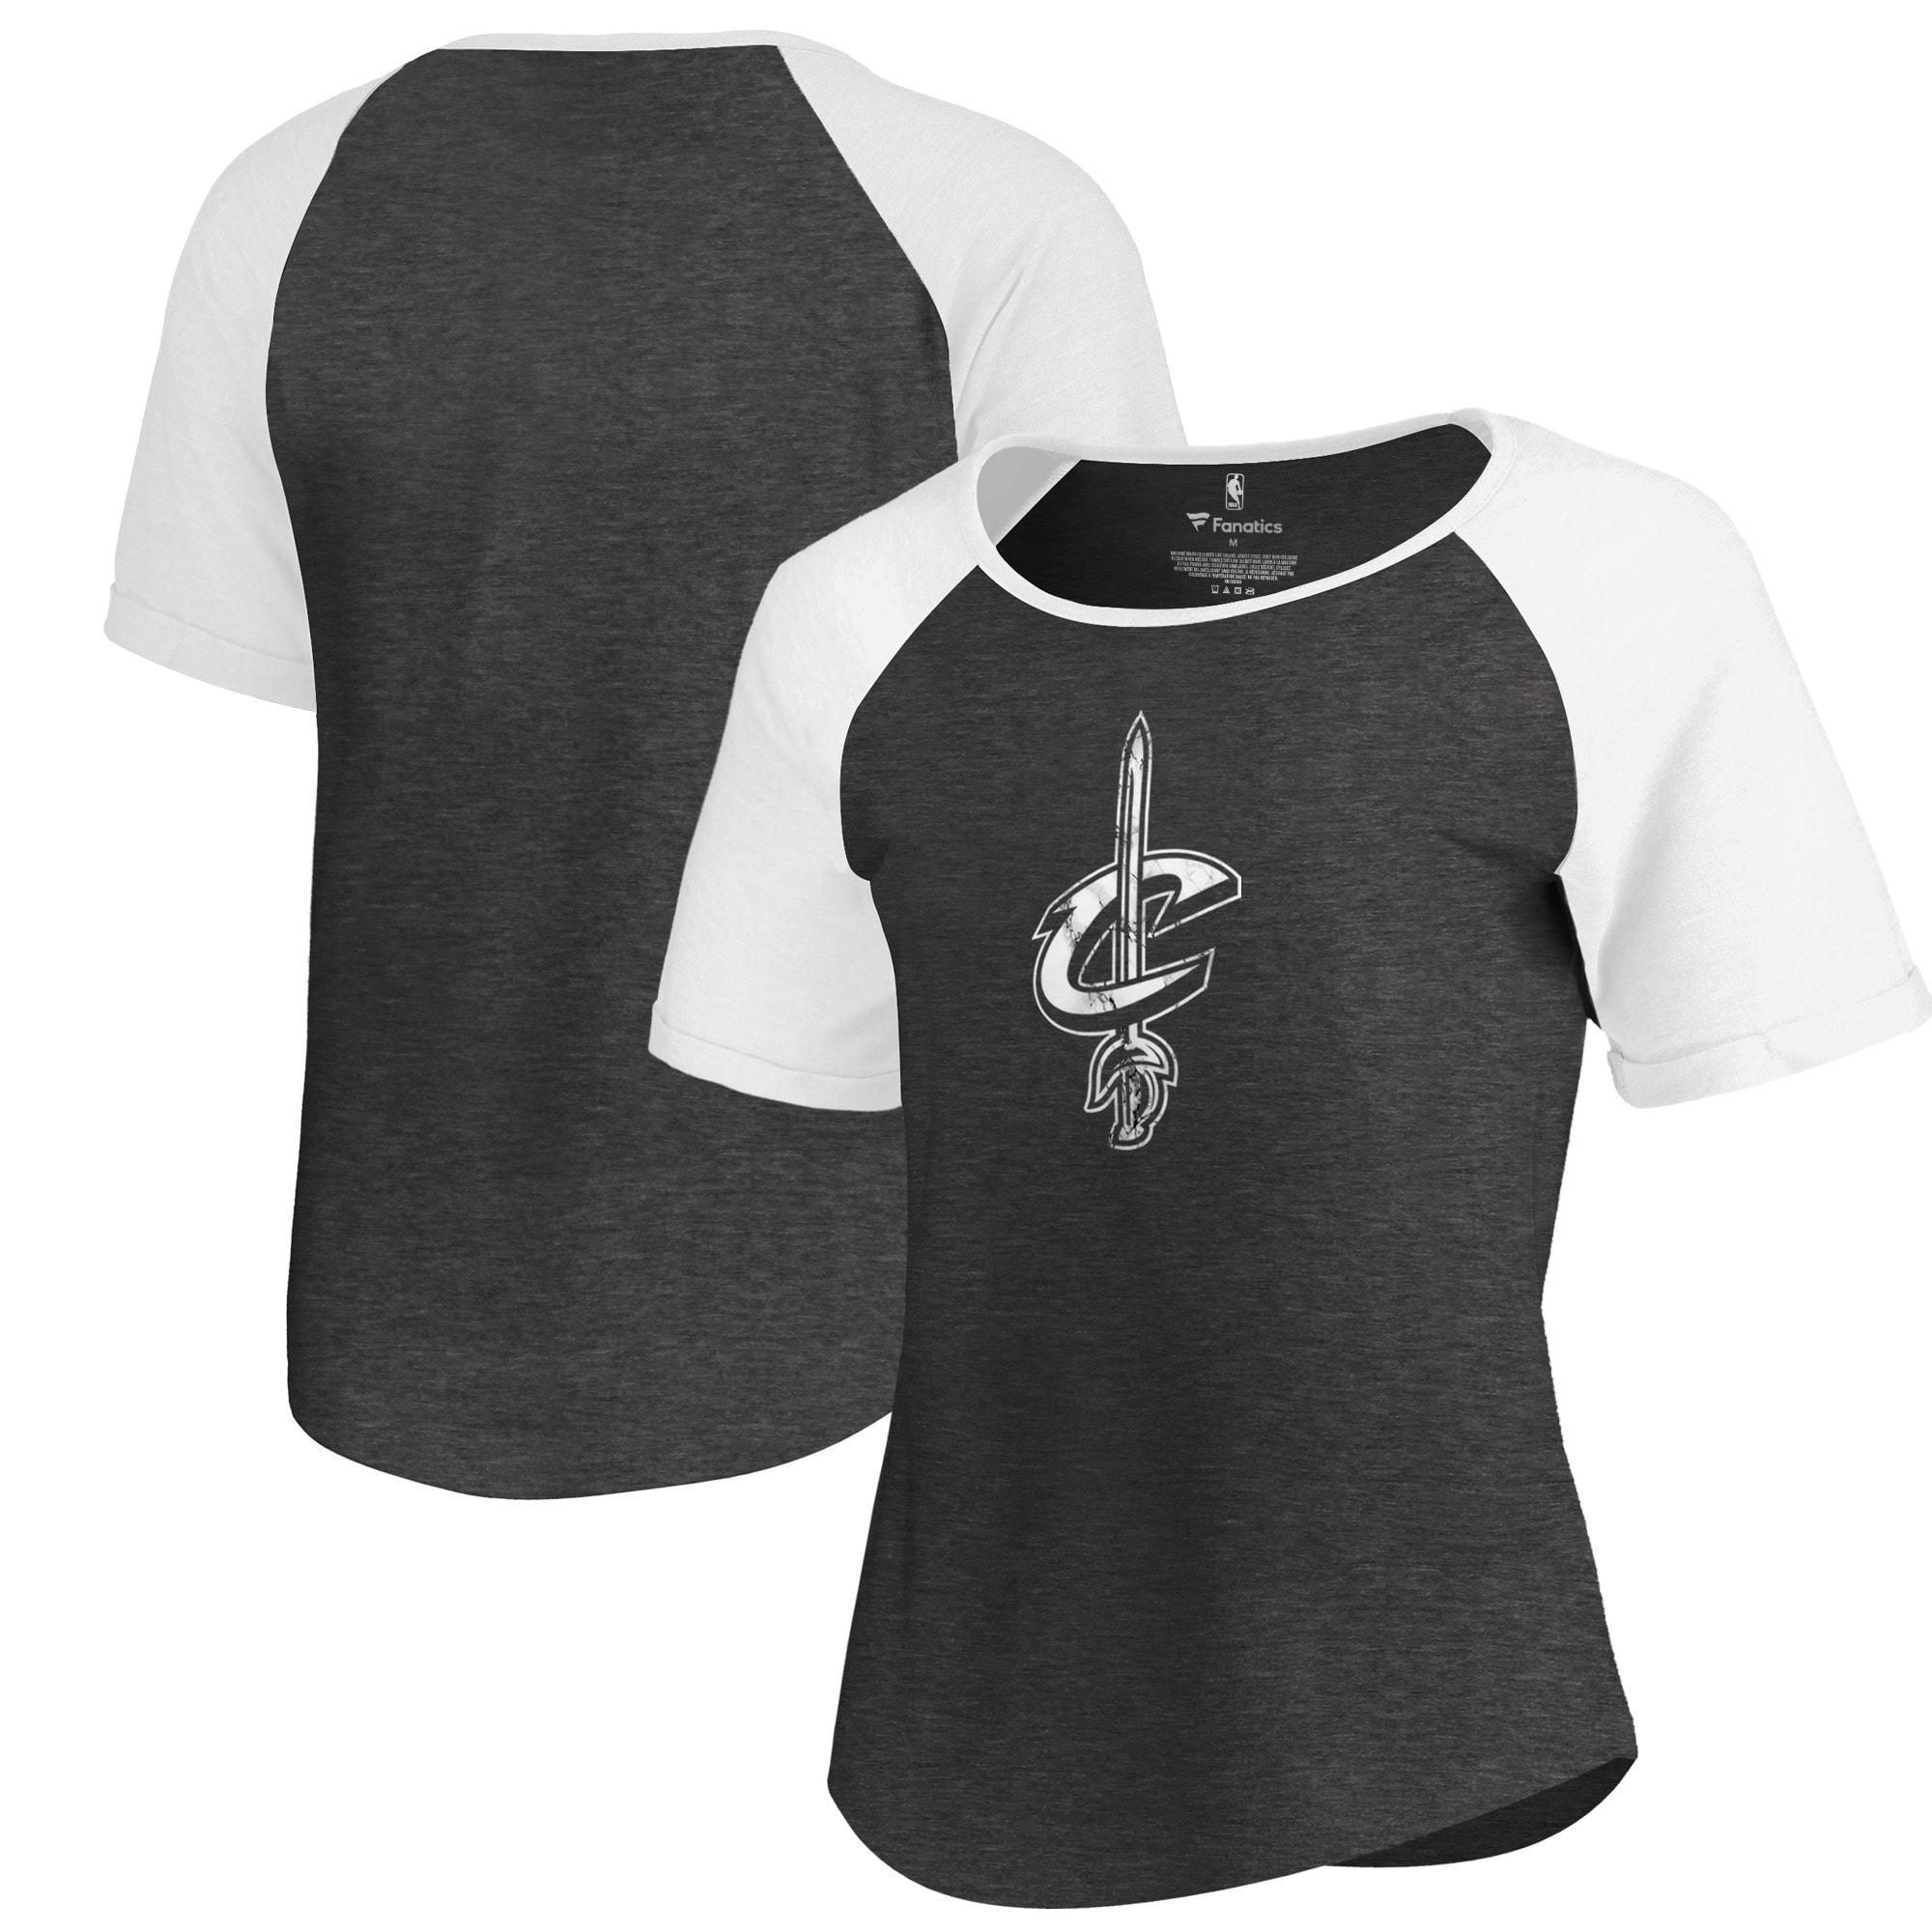 Cleveland Cavaliers Fanatics Branded Women's Marble Logo Raglan T-Shirt - Black